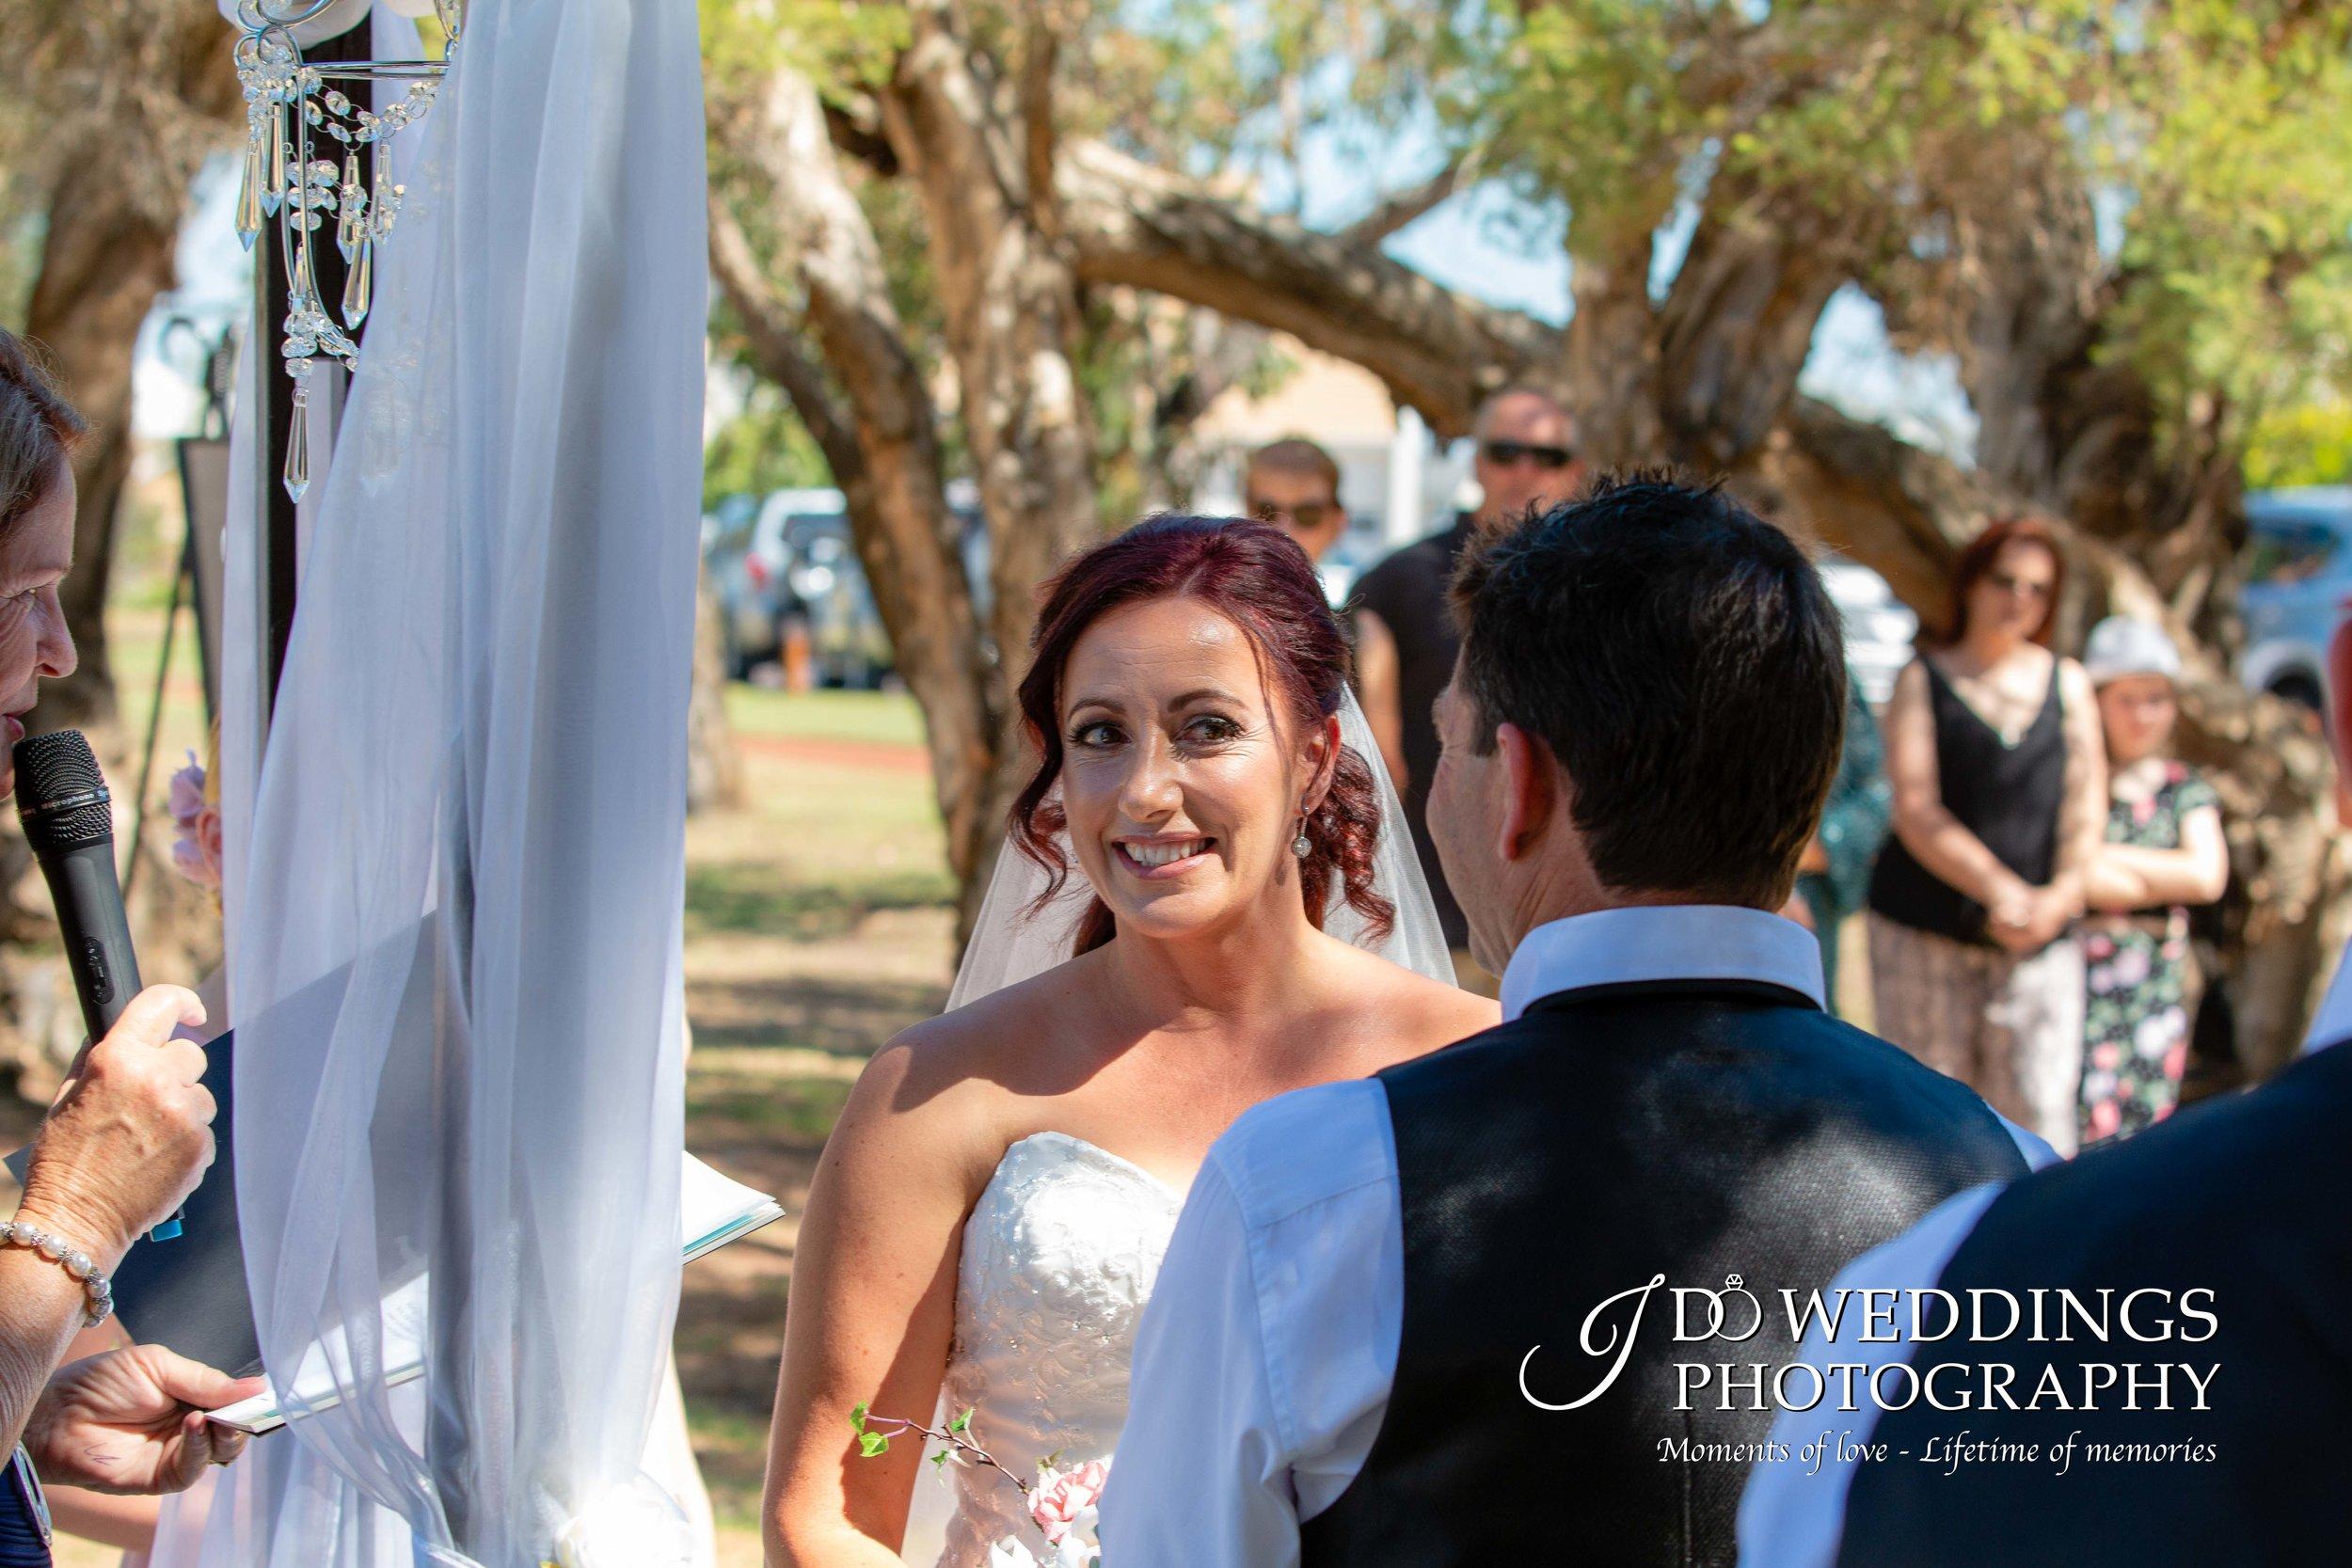 wedding images6.jpg